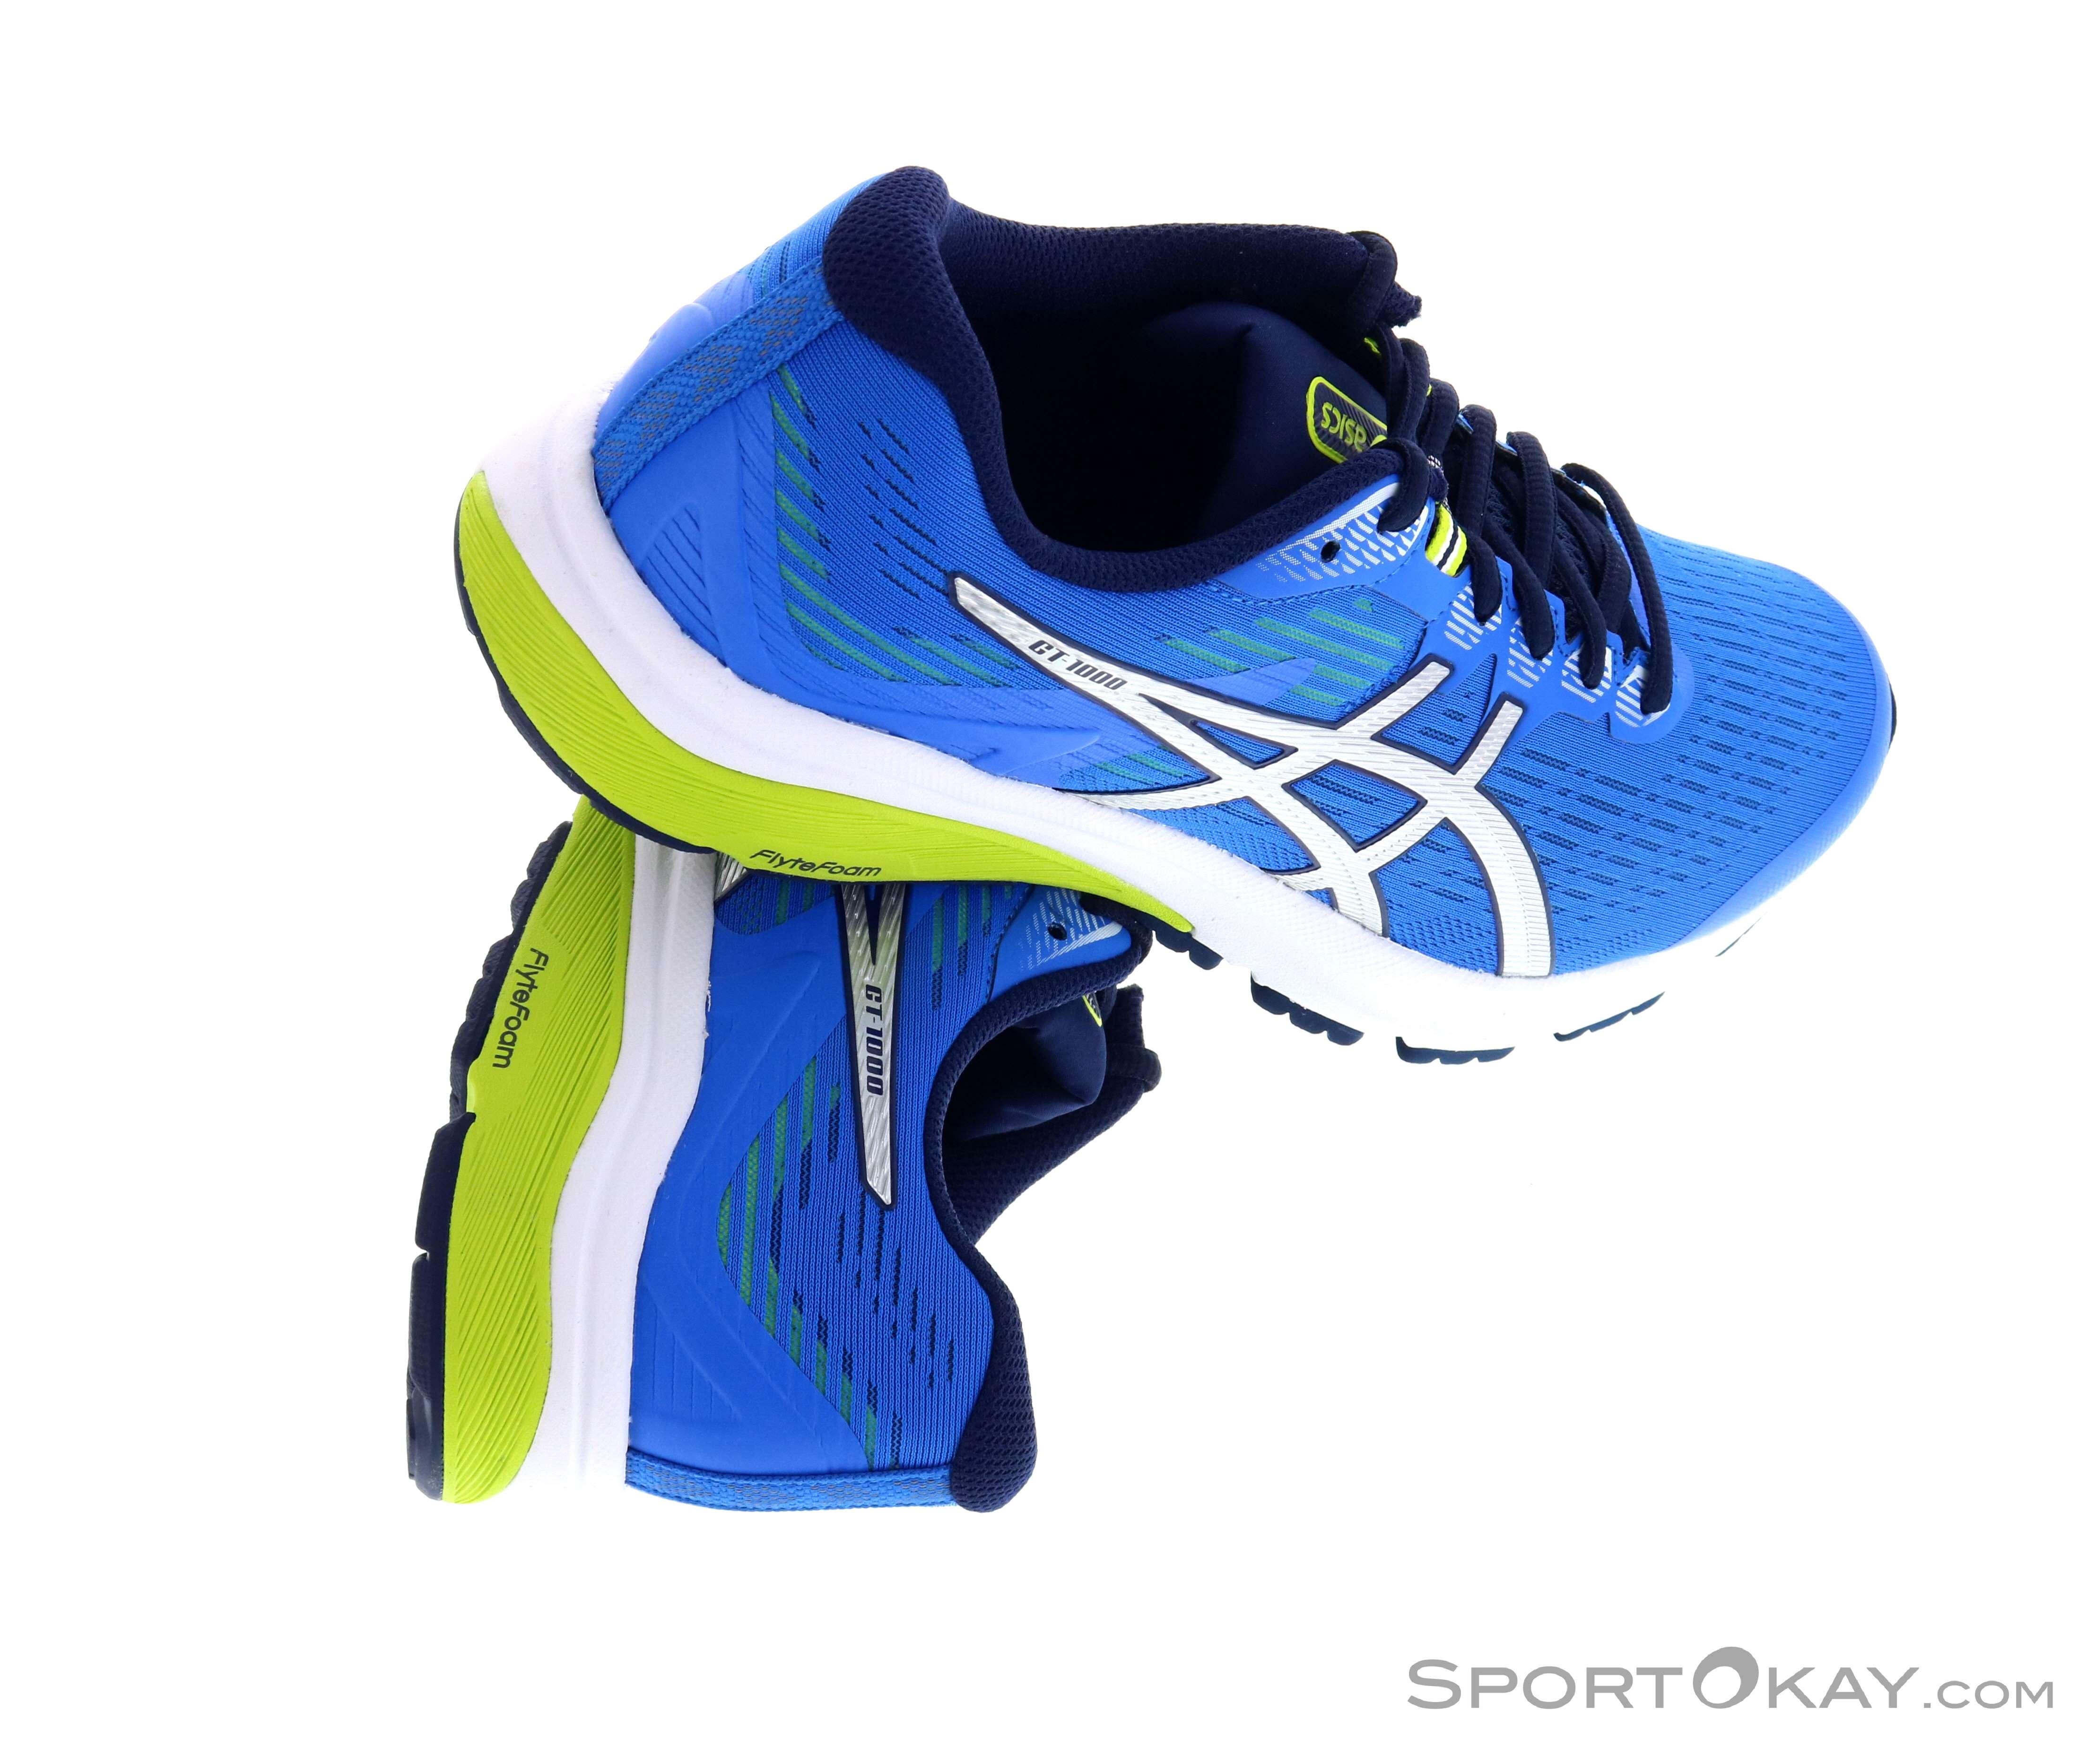 Asics Asics GT 1000 8 Mens Running Shoes